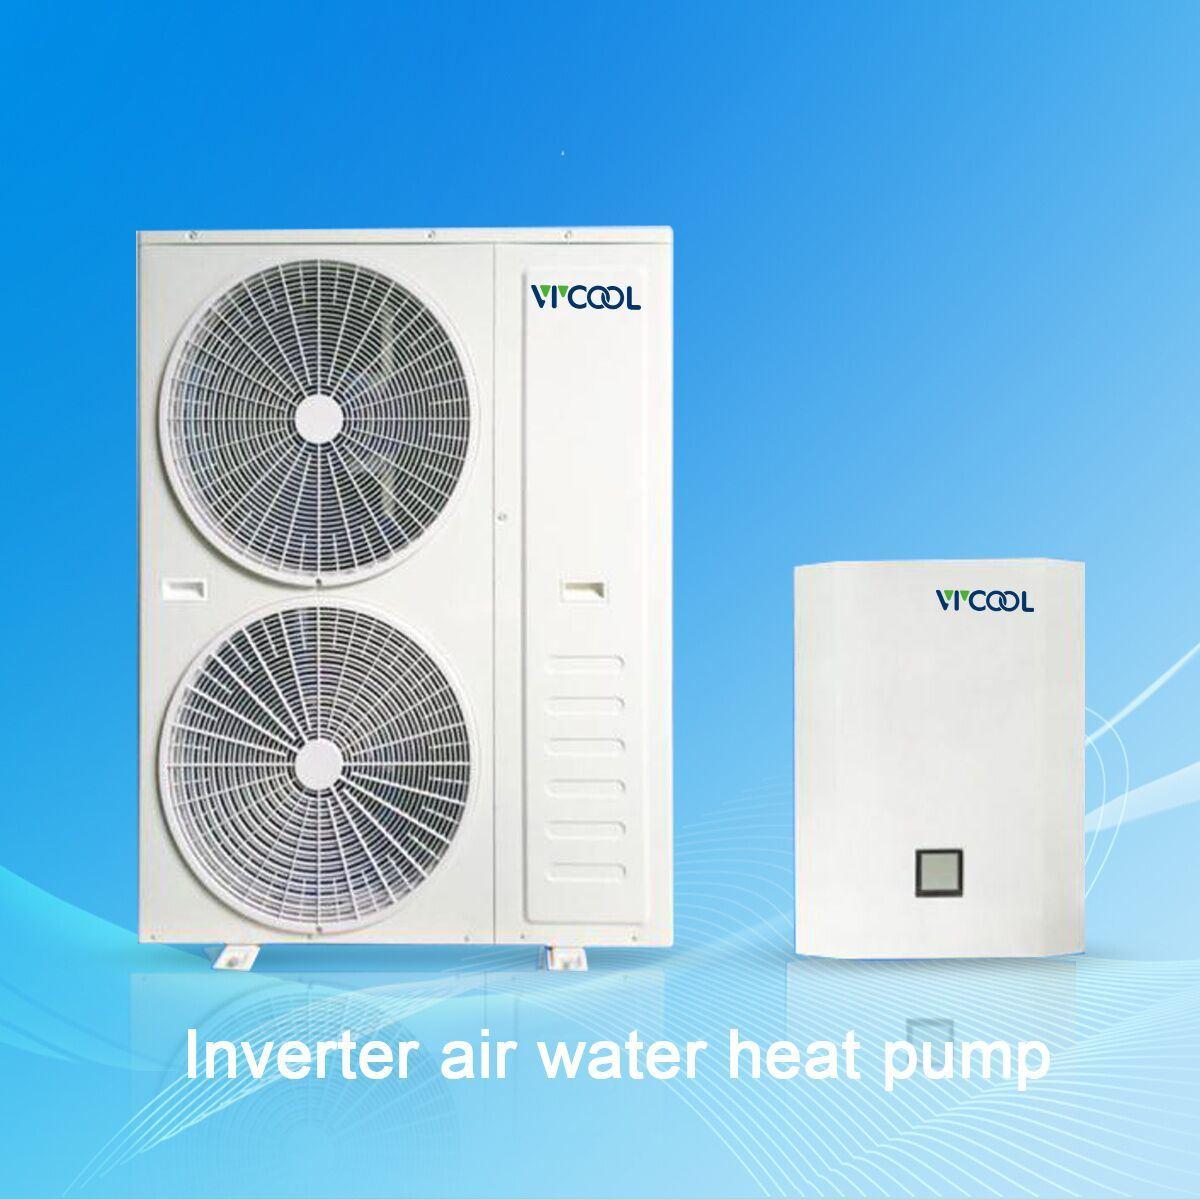 Inverter Air Water Heat Pump Split Type